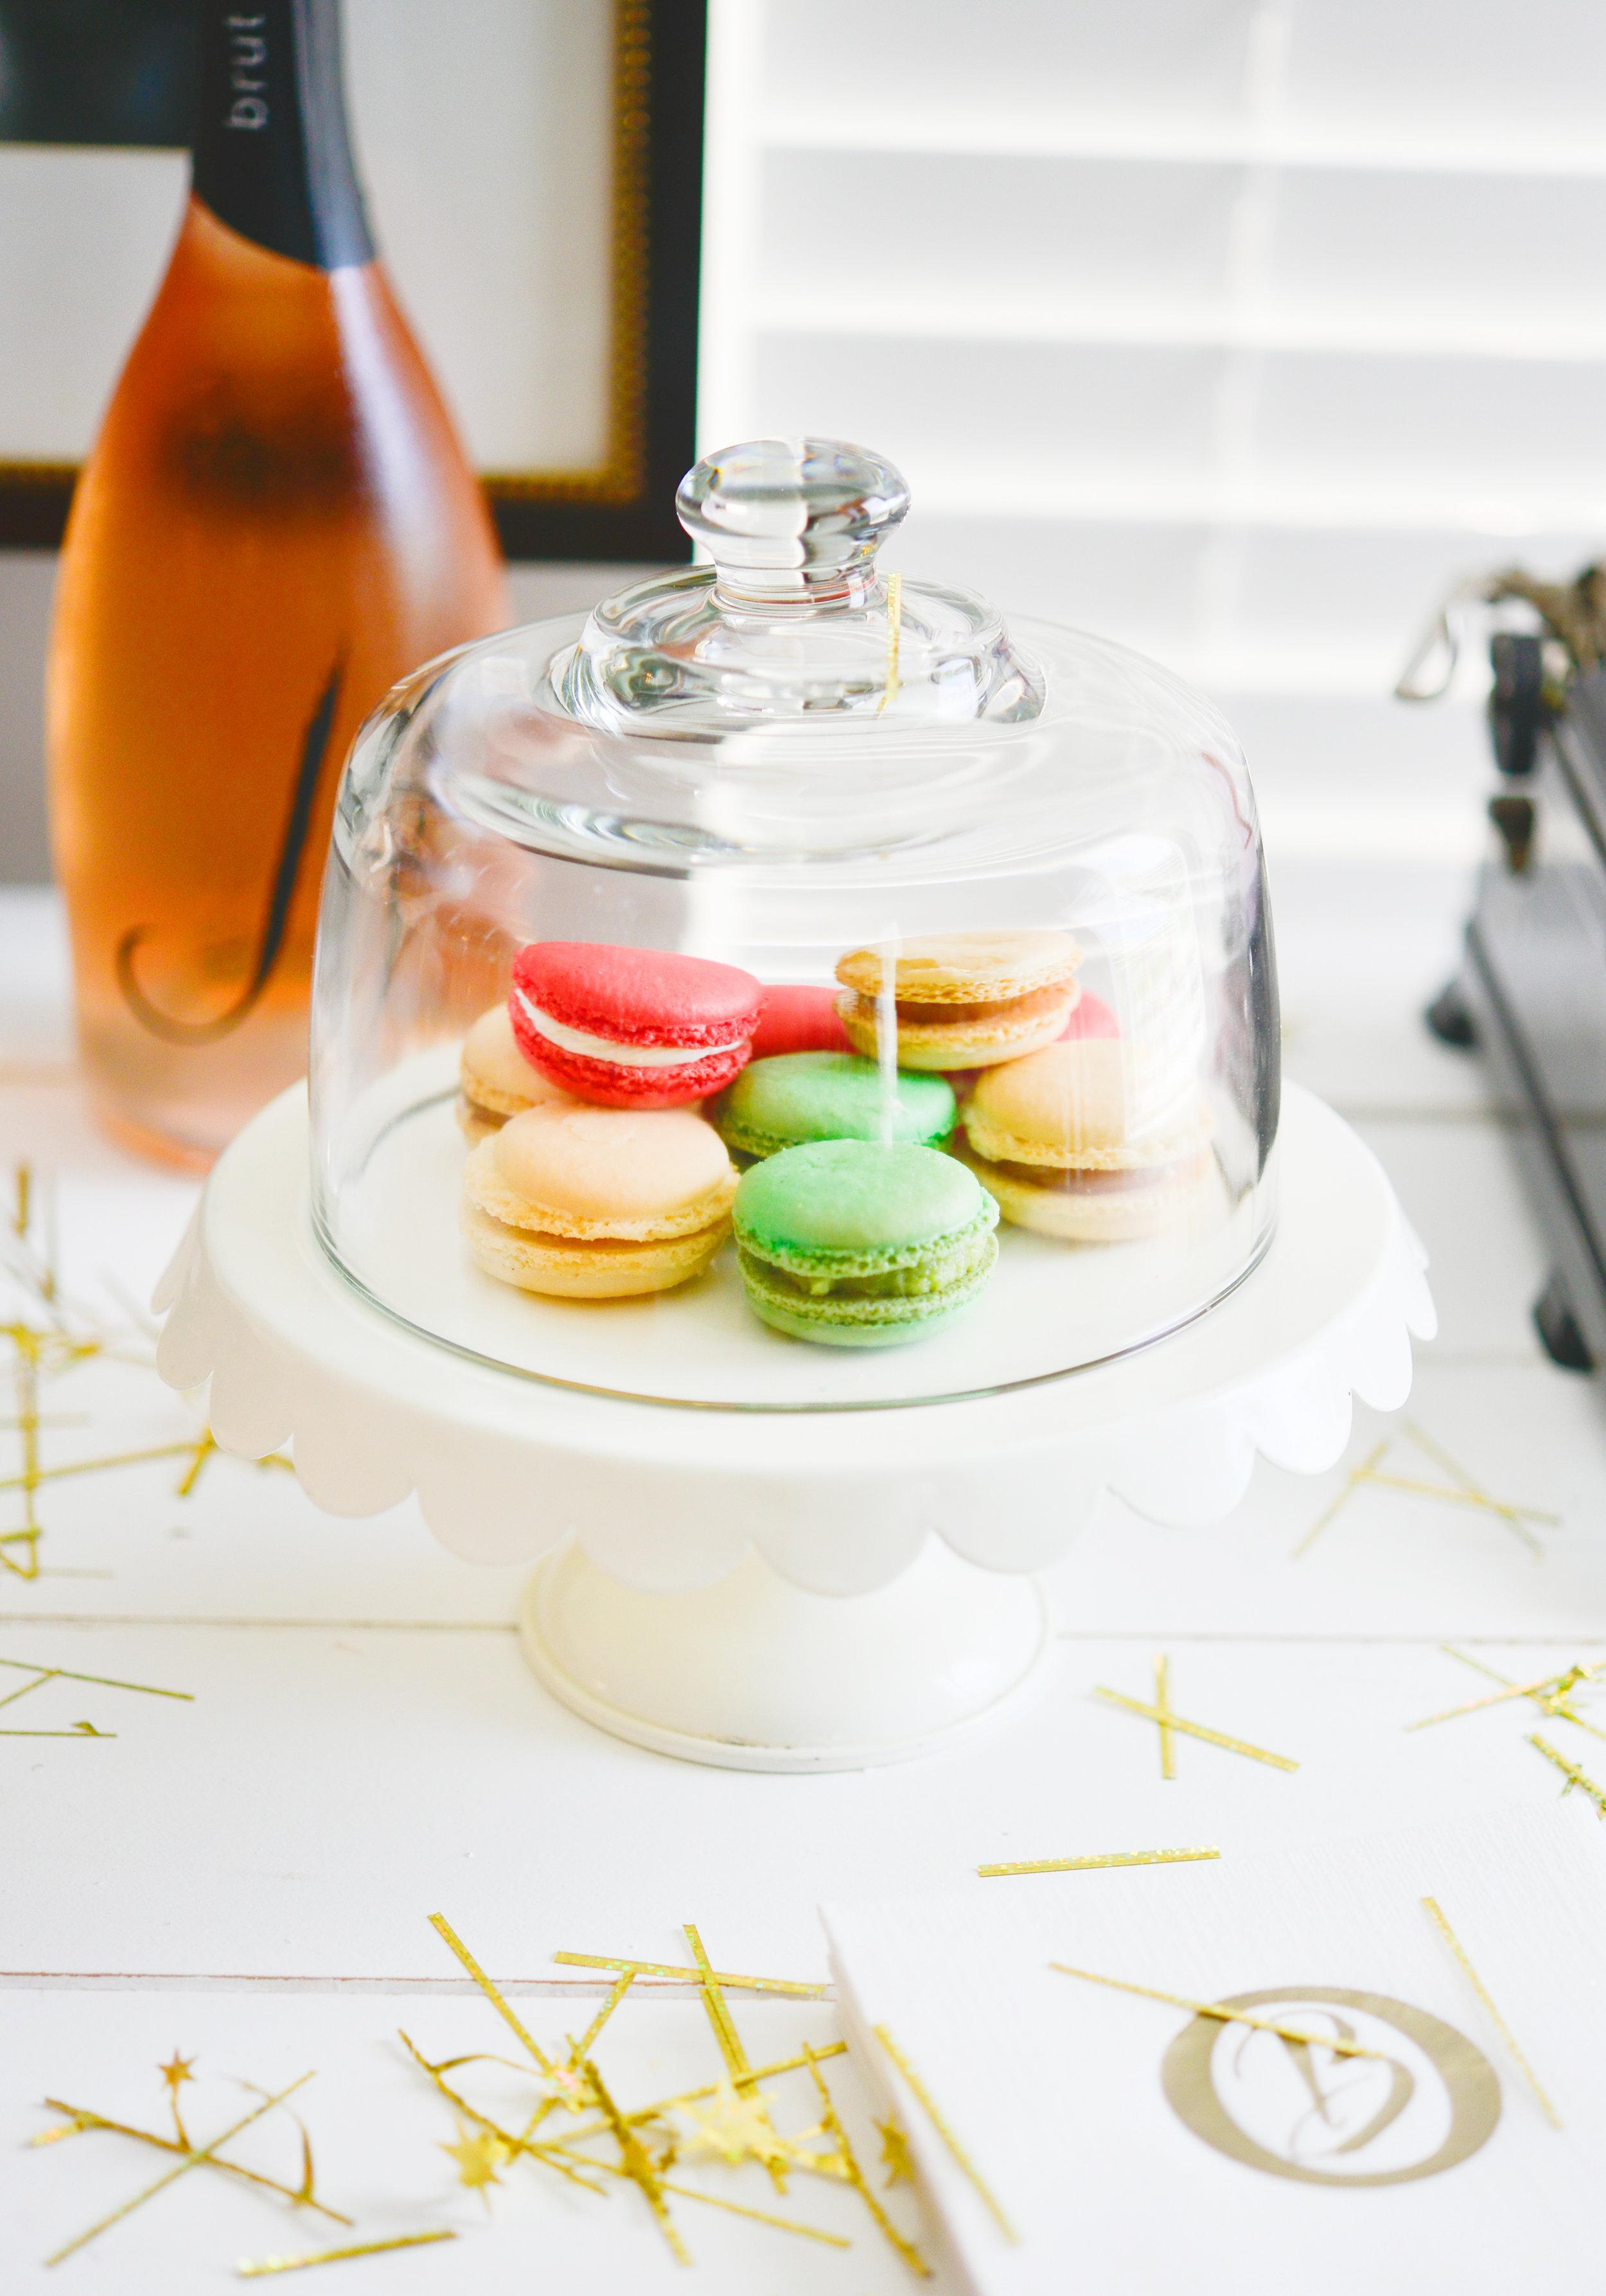 My Splendid Living | Mimosa Bar and Macaroons